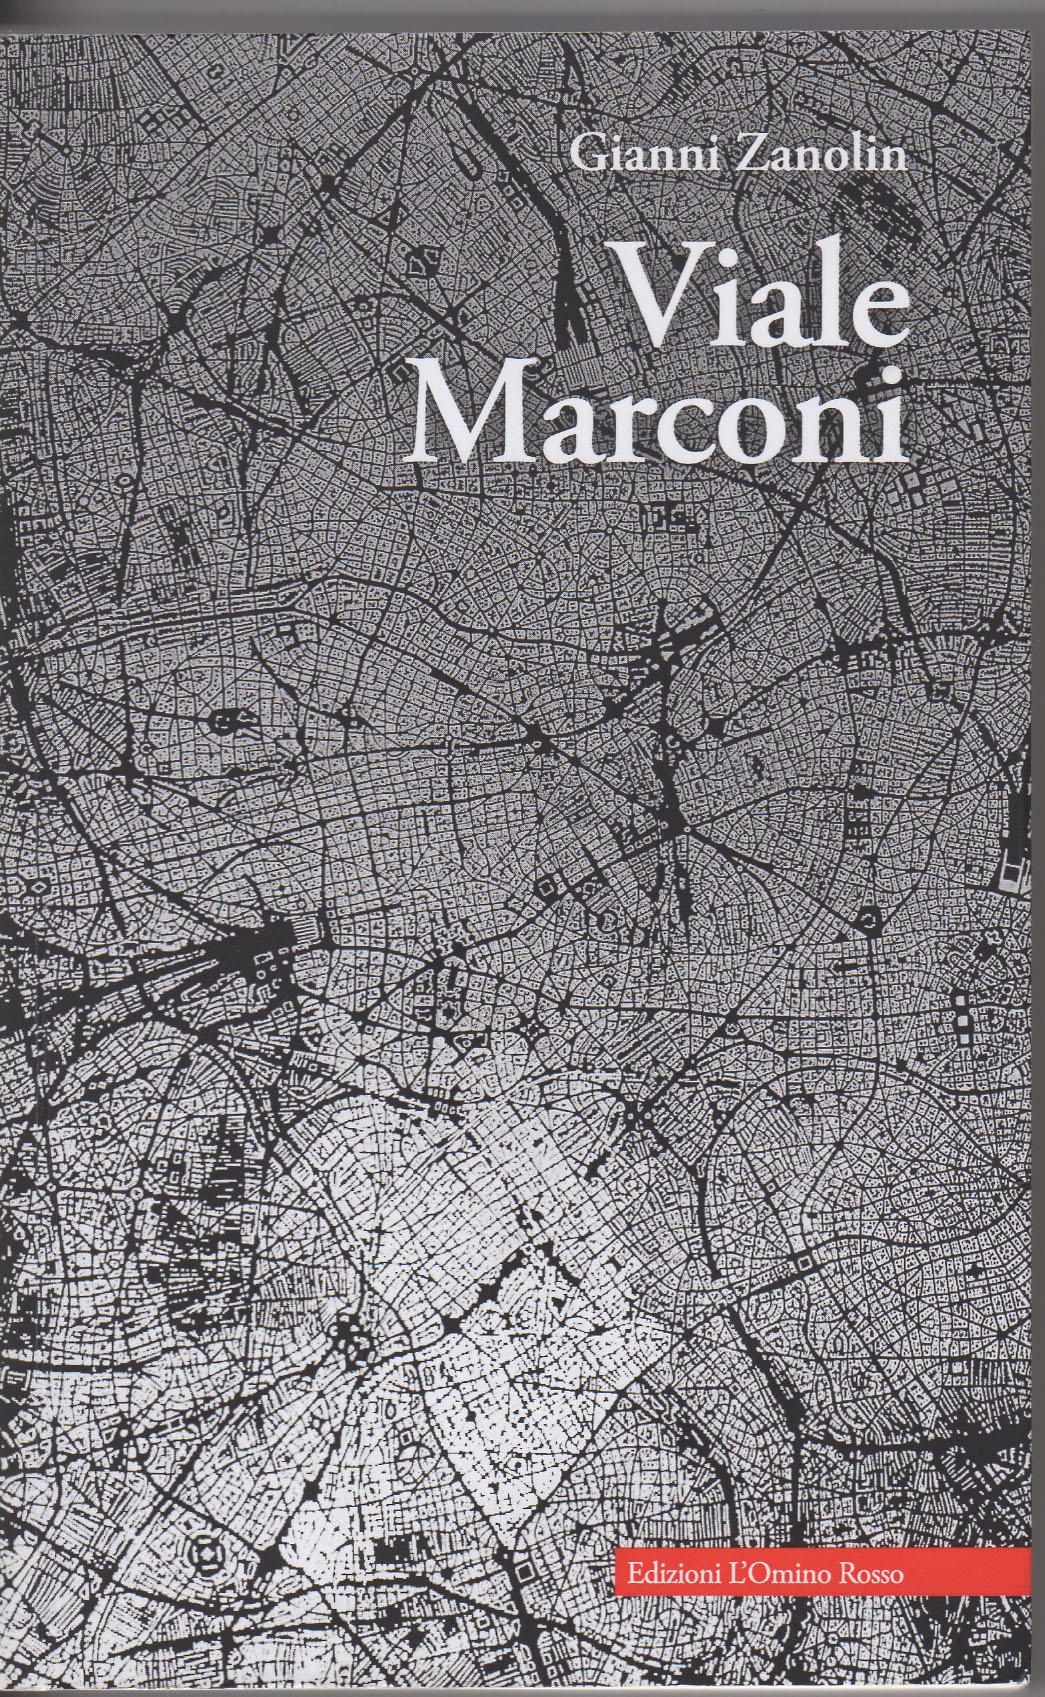 Viale Marconi